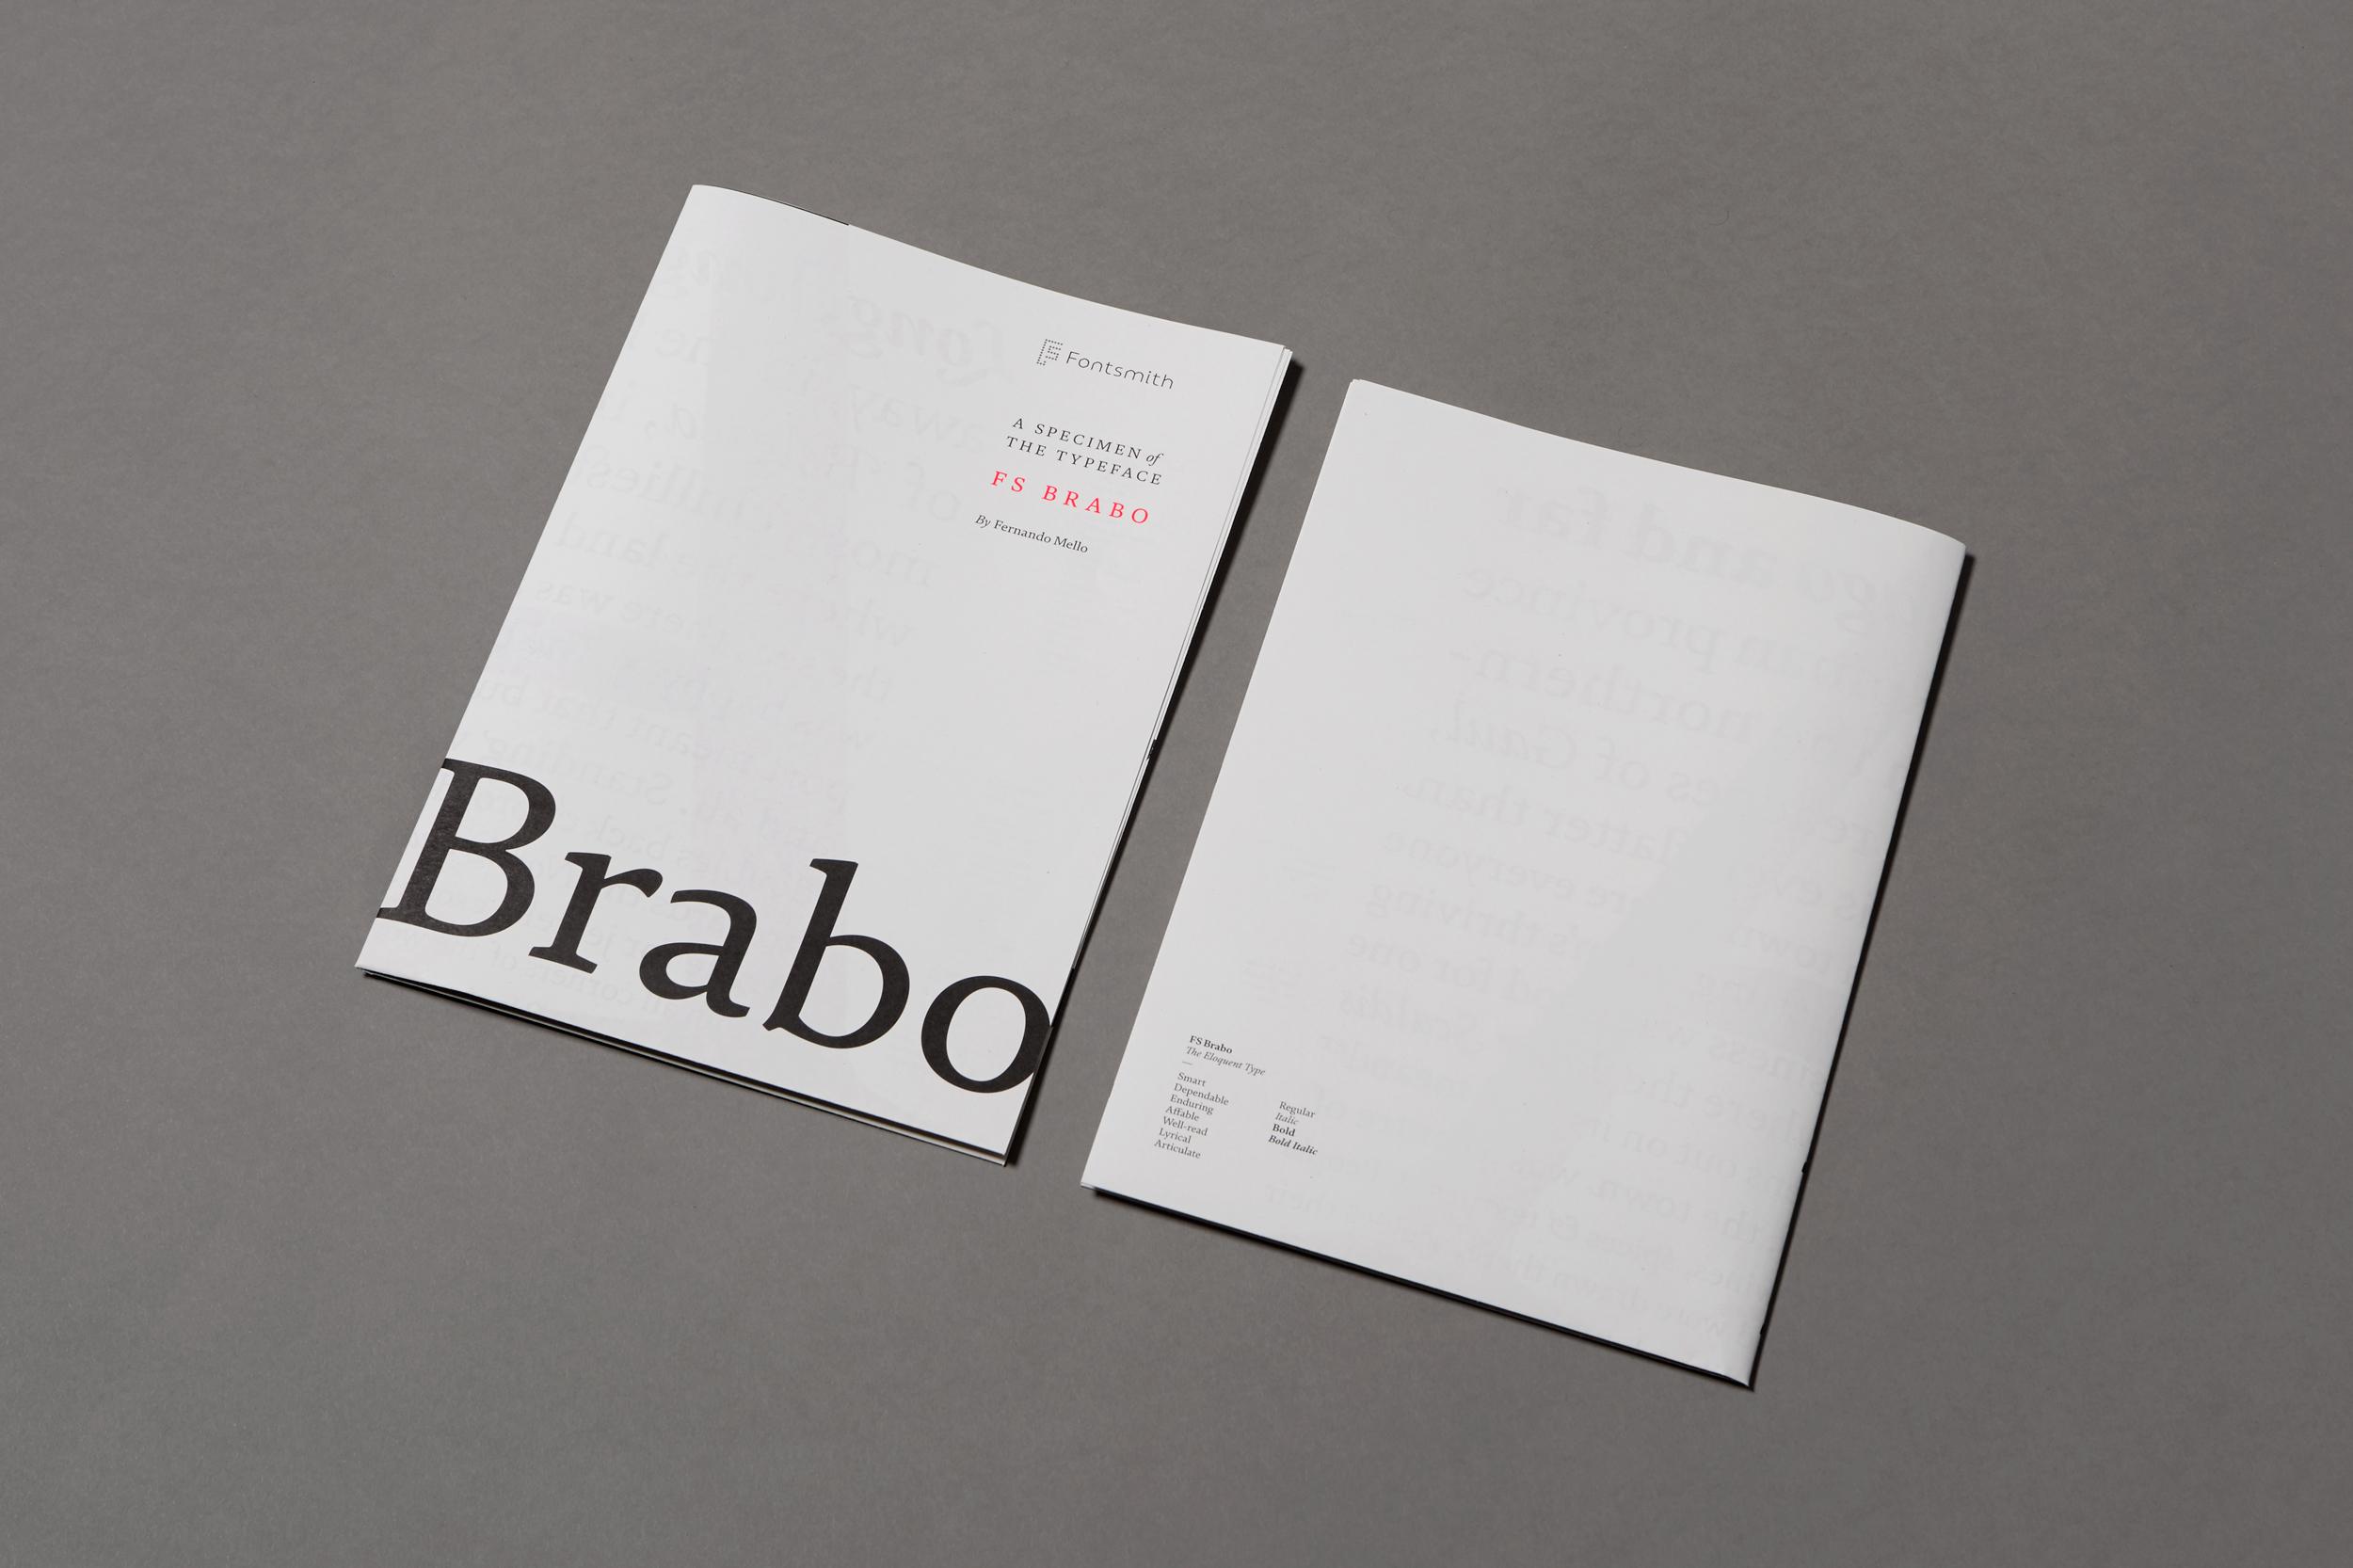 CounterStudio_Brabo_Folded_covers_1.jpg